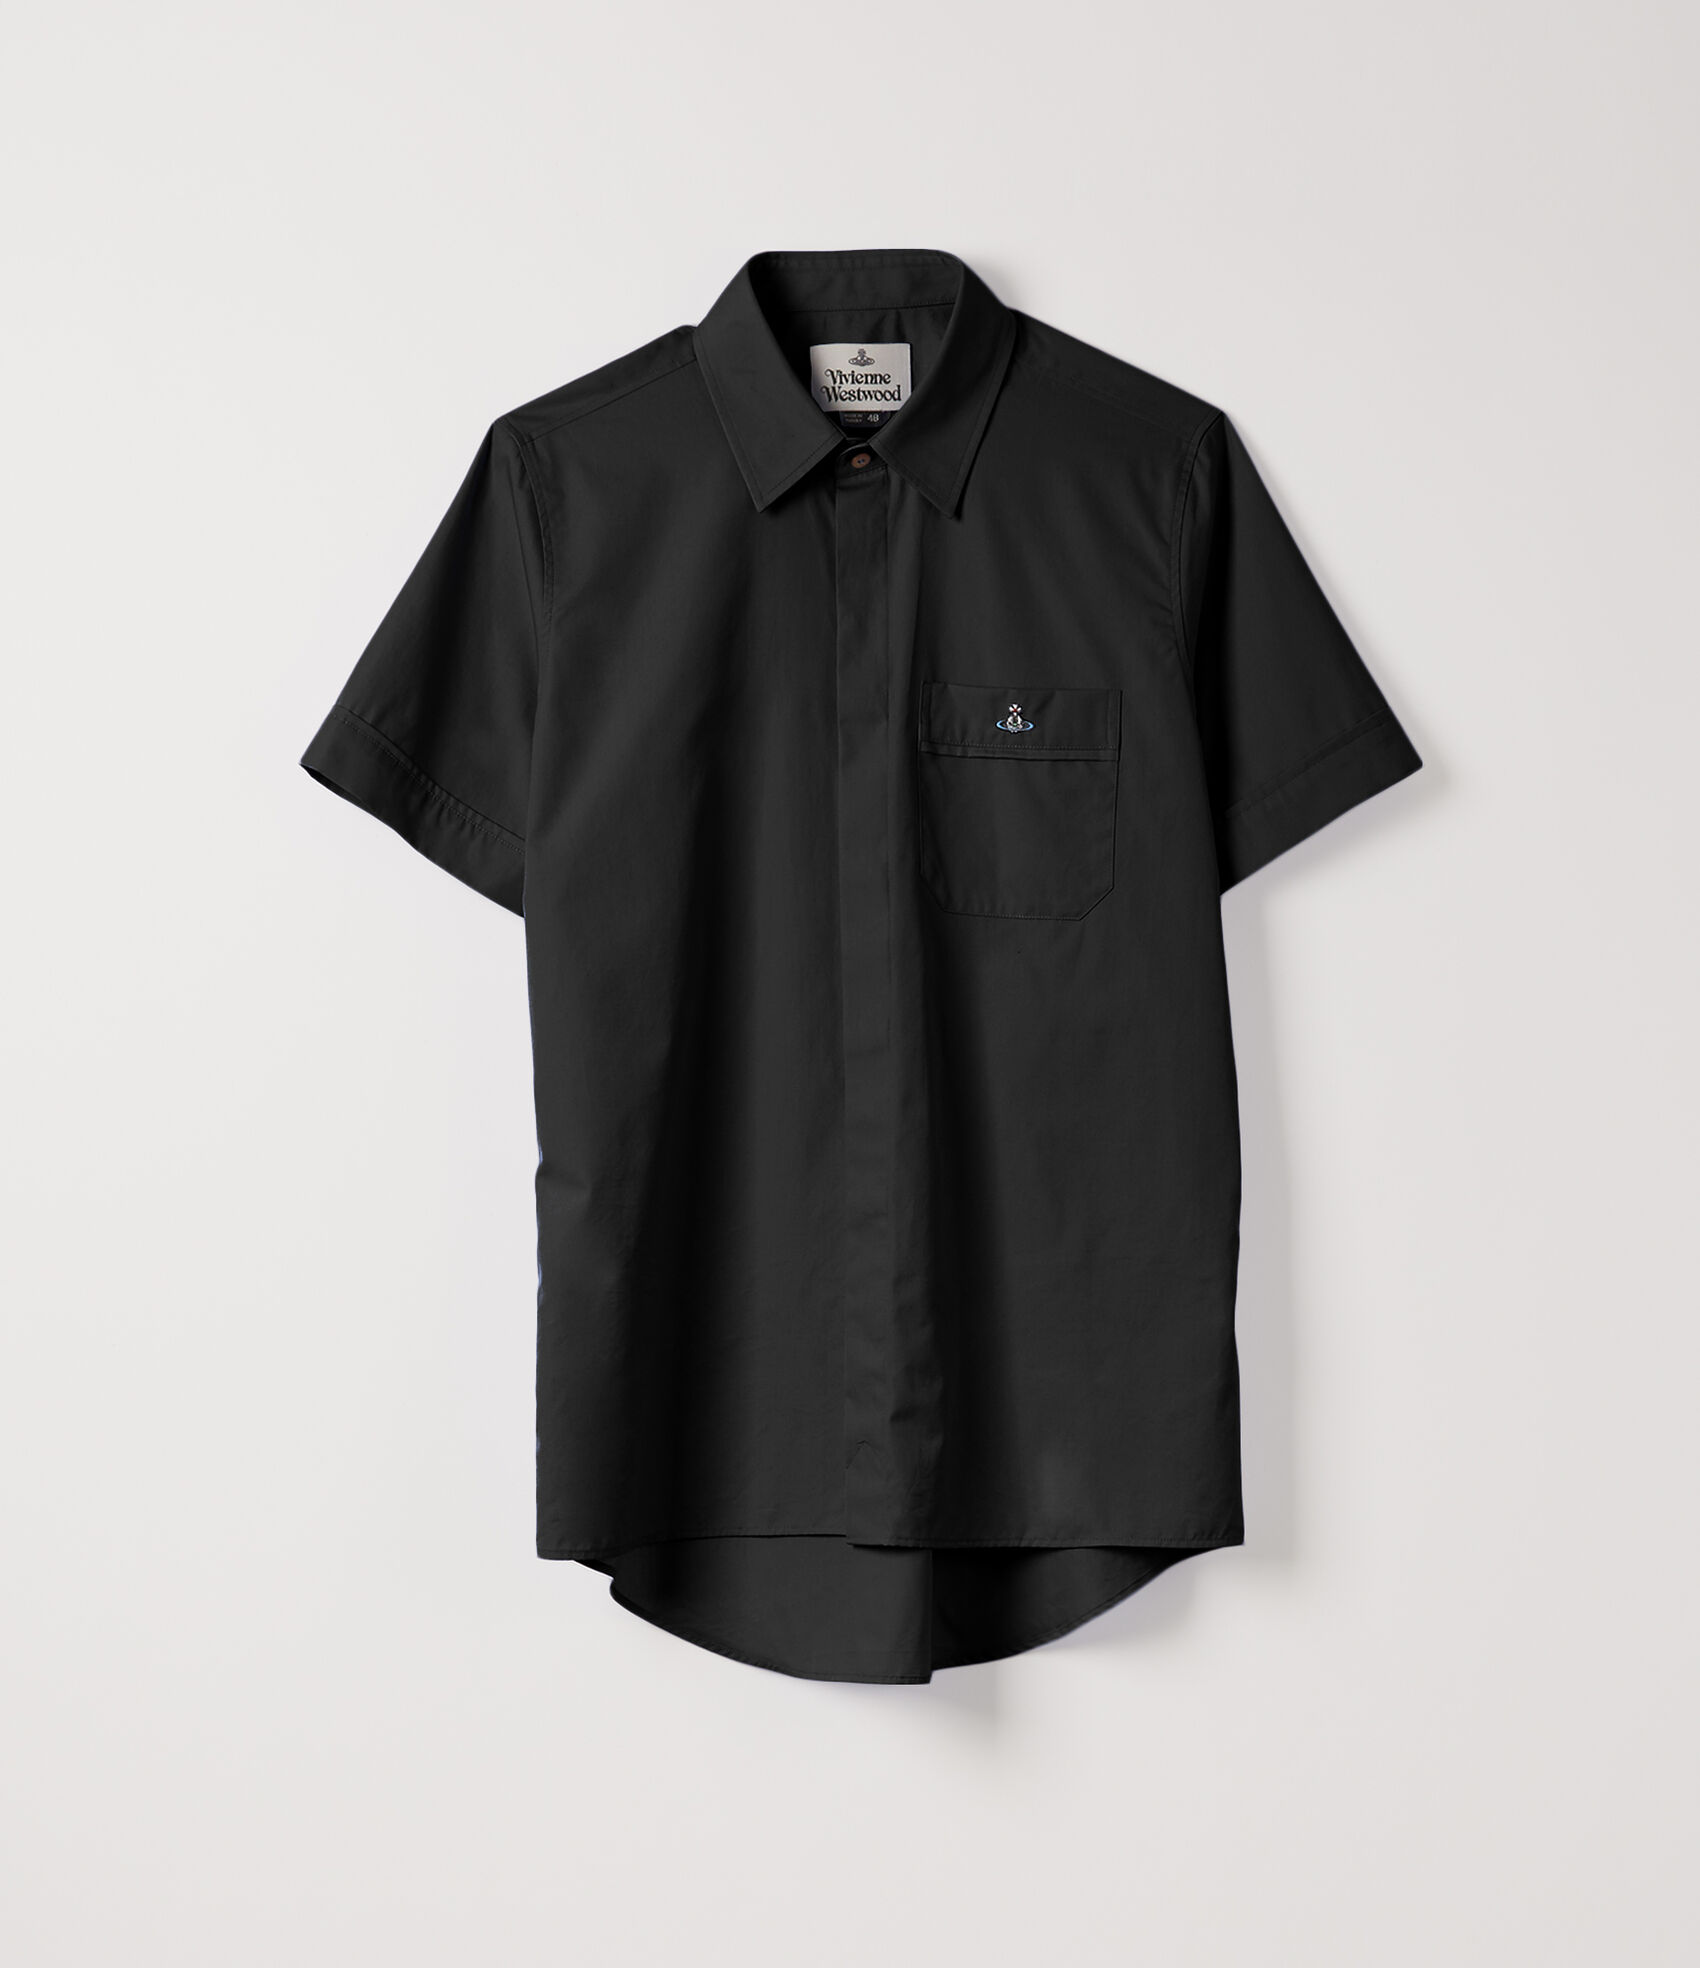 e983393357bd Vivienne Westwood Men s Designer Shirts